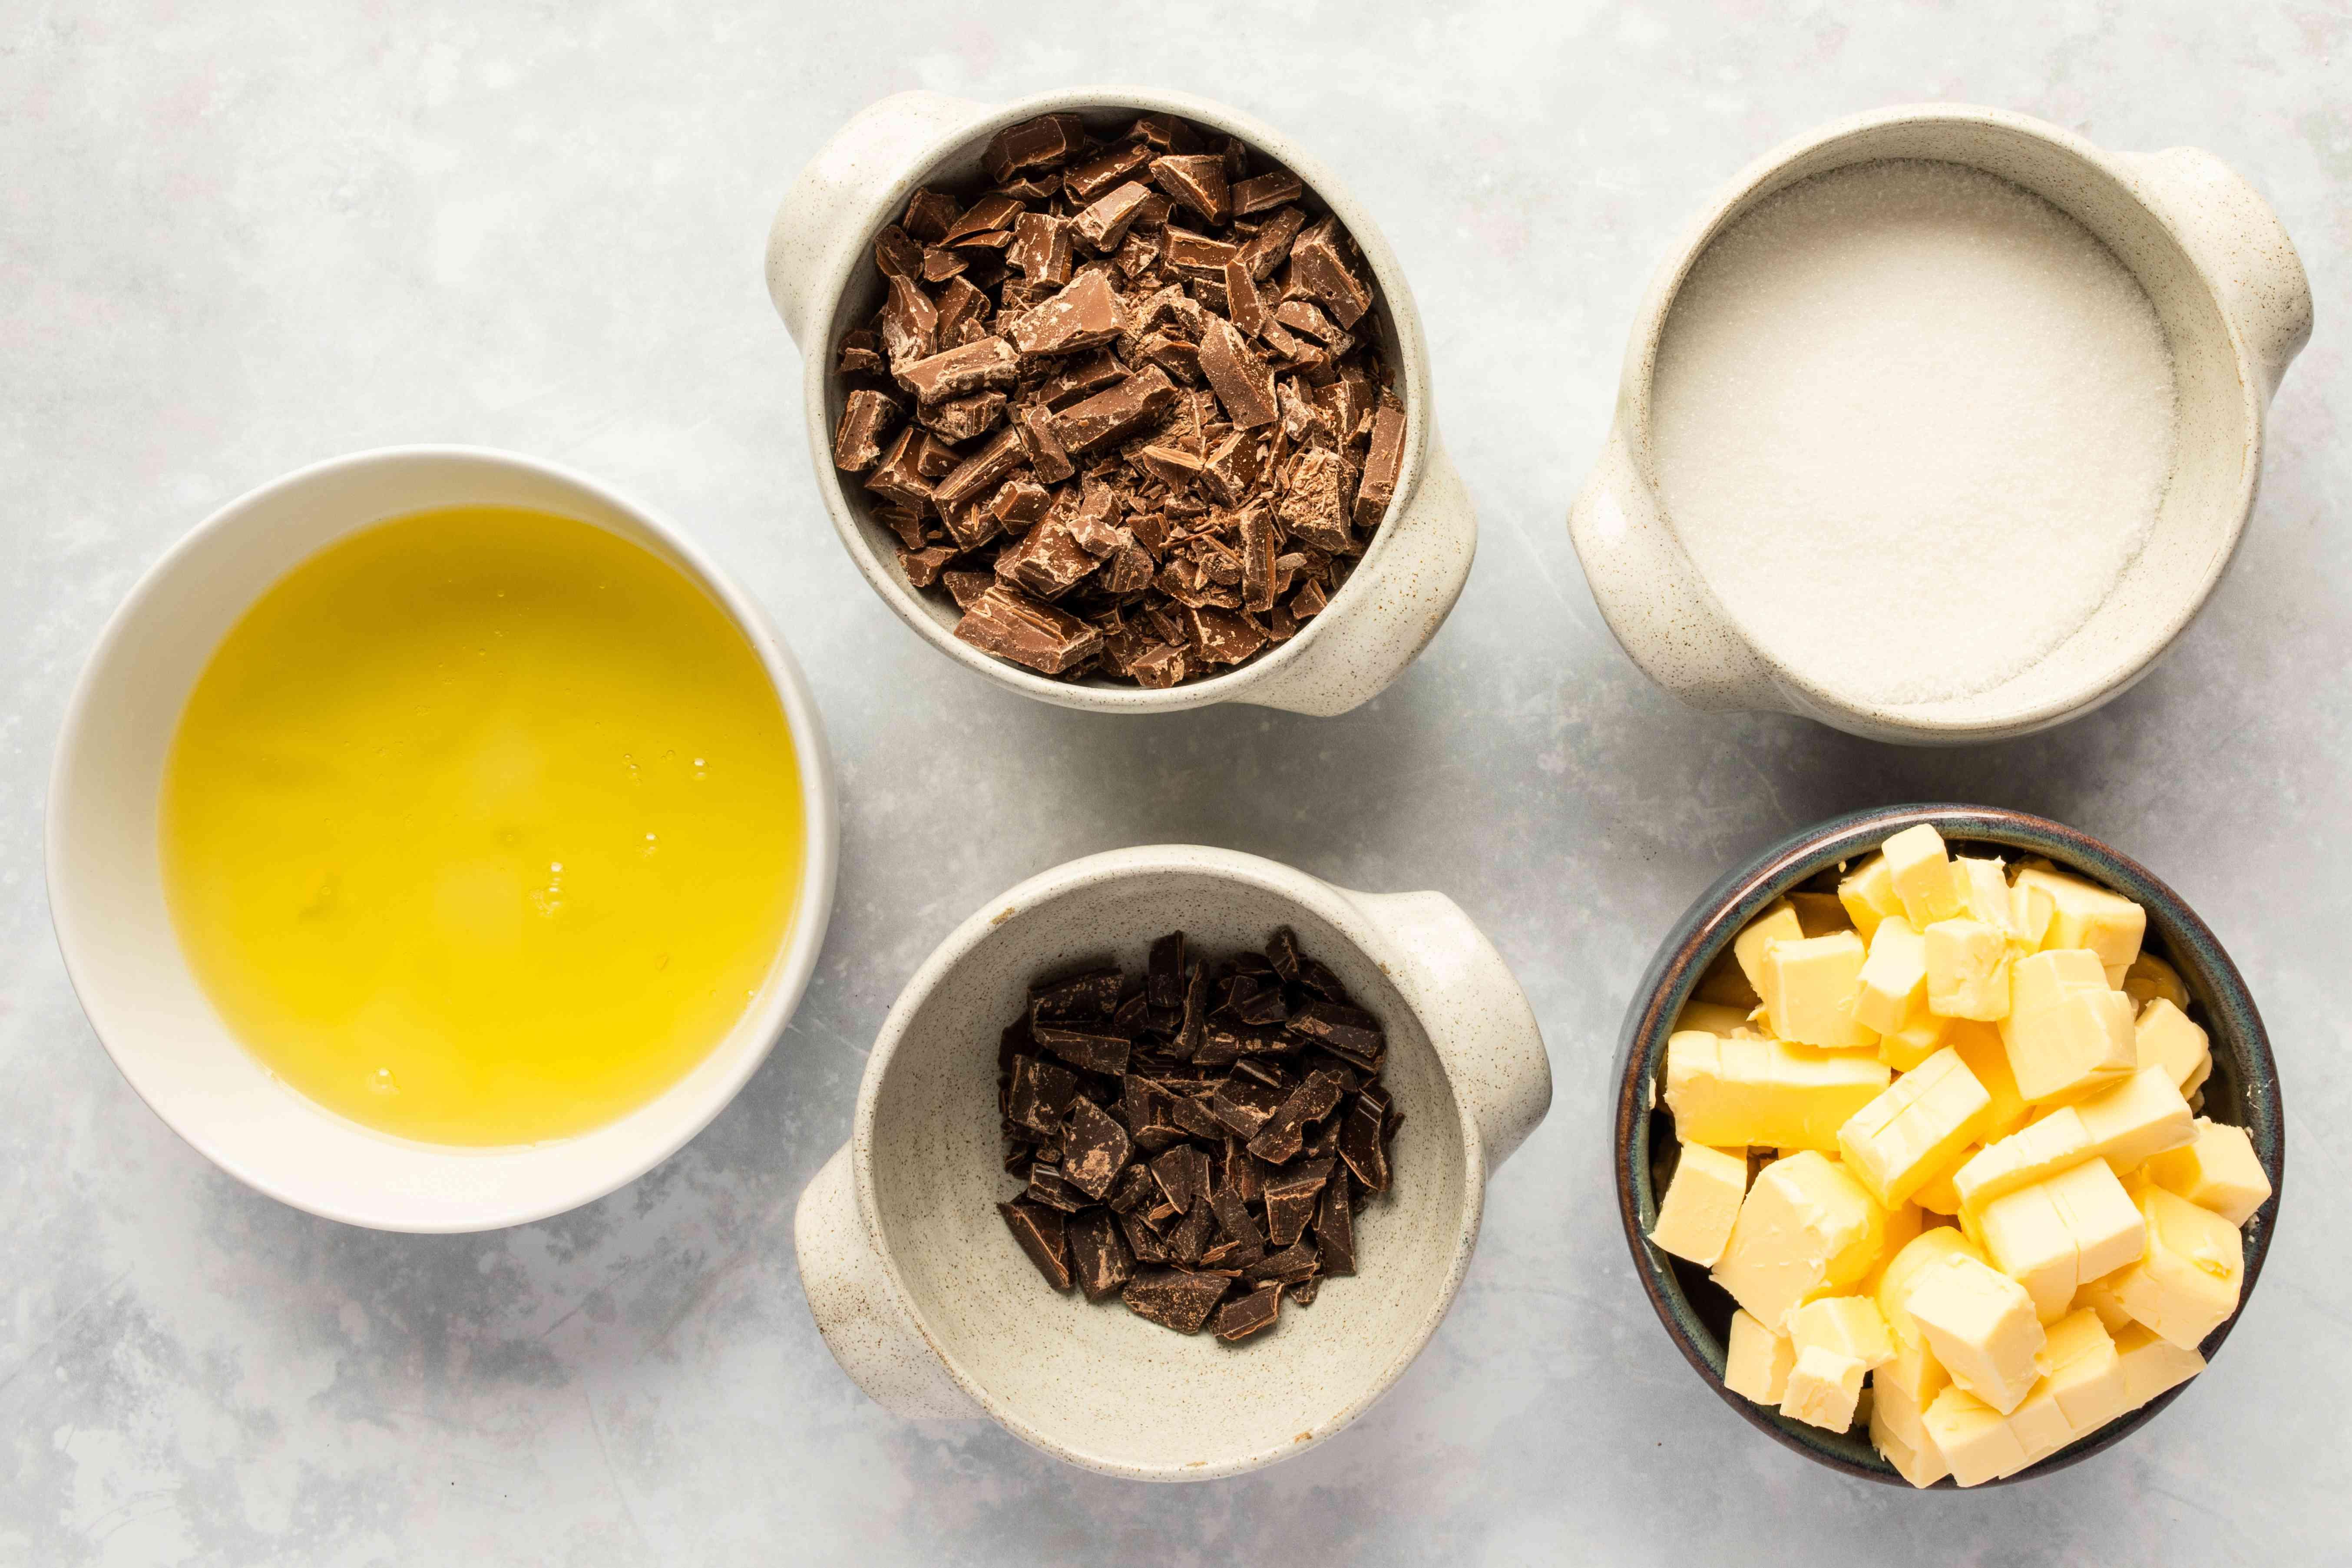 Ingredients for dobosh torte filling